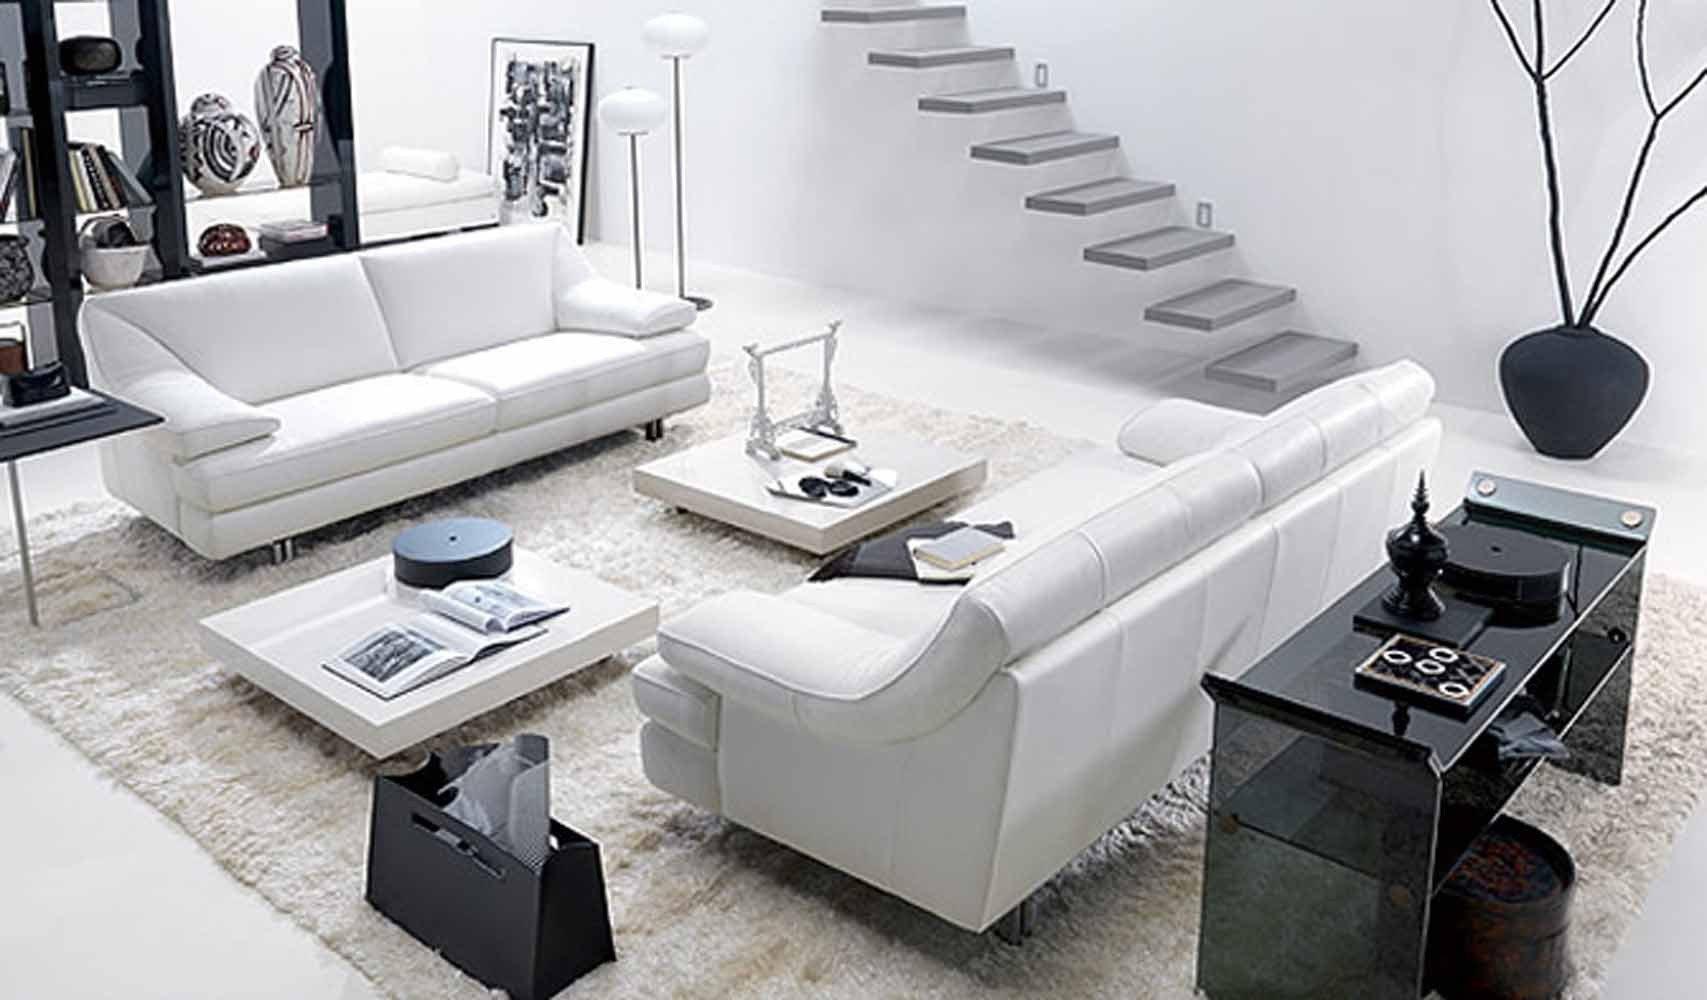 Black and White Living Room Decorating Ideas Inspirational 17 Inspiring Wonderful Black and White Contemporary Interior Designs Homesthetics Inspiring